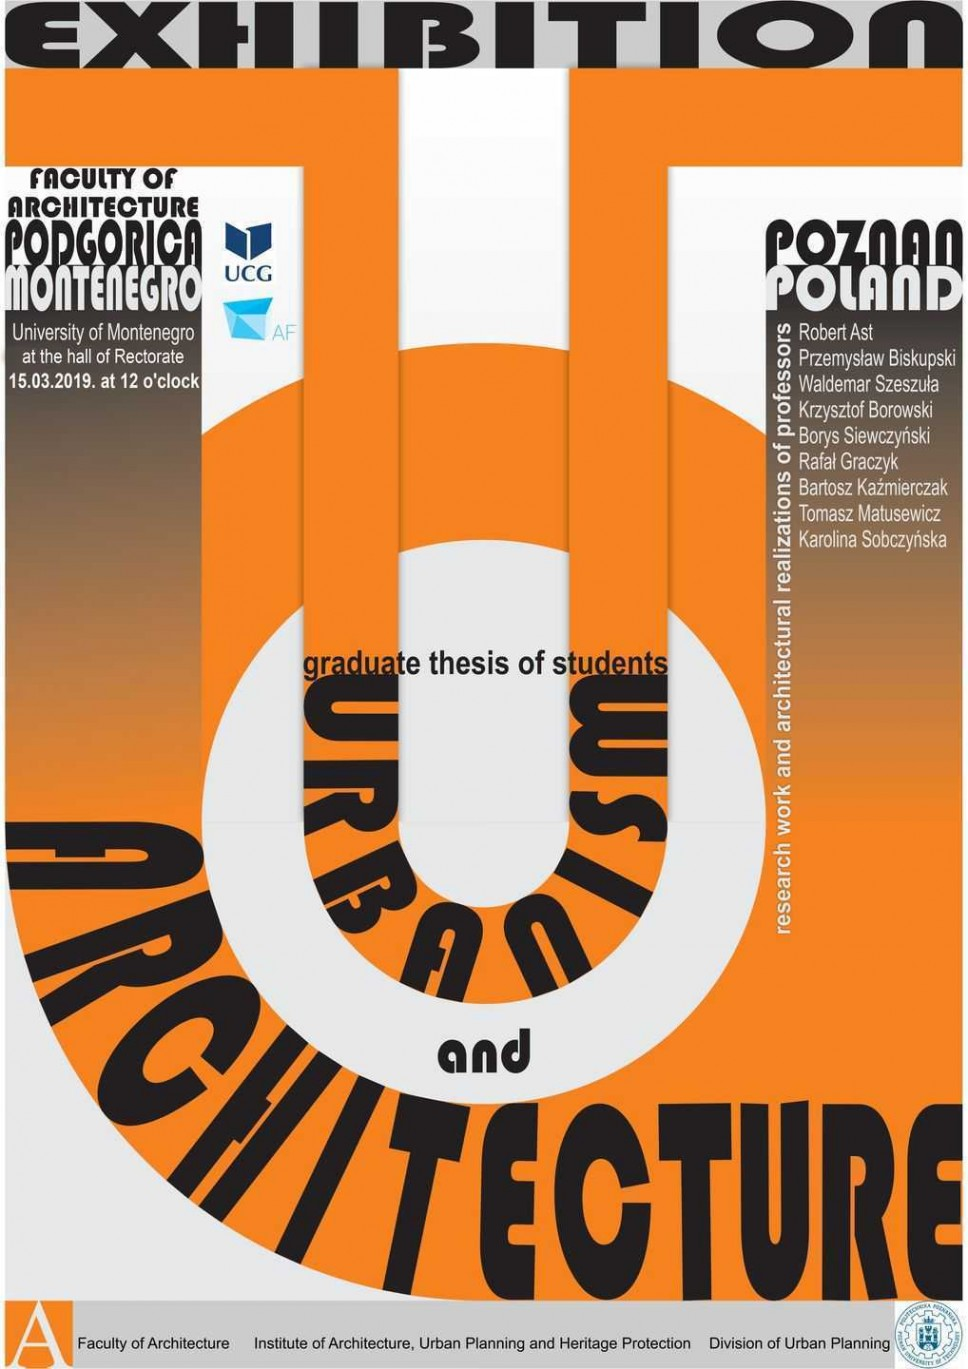 Otvaranje izložbe radova studenata i profesora arhitekture iz Poljske